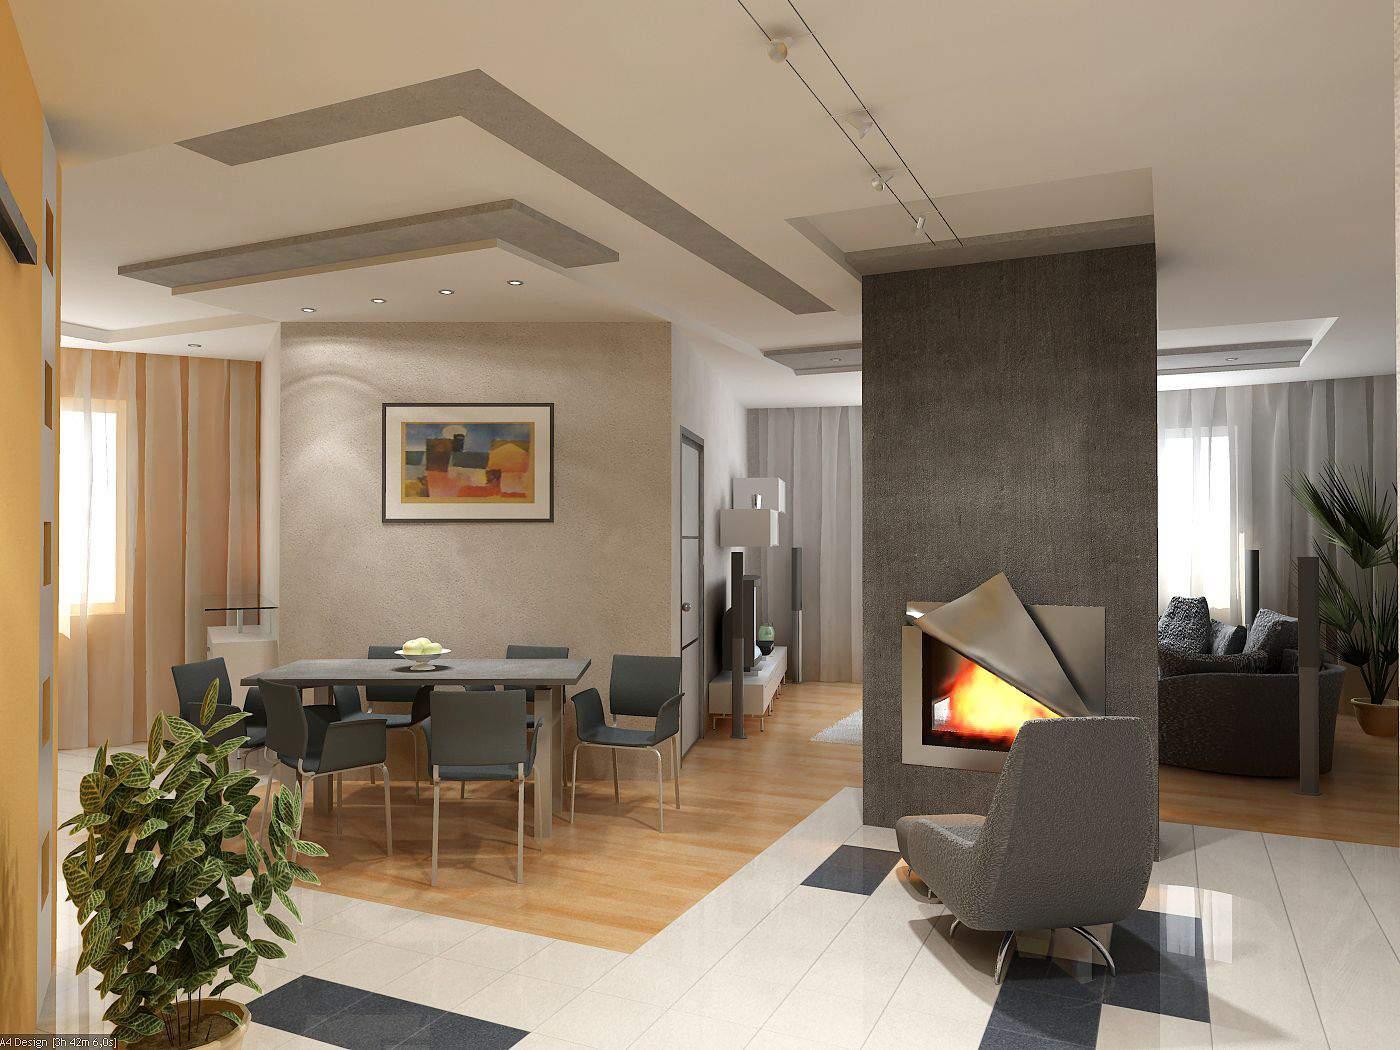 Home Interior Designs Ideas Home Wallpaper 14758 Wallpaper computer 1400x1050